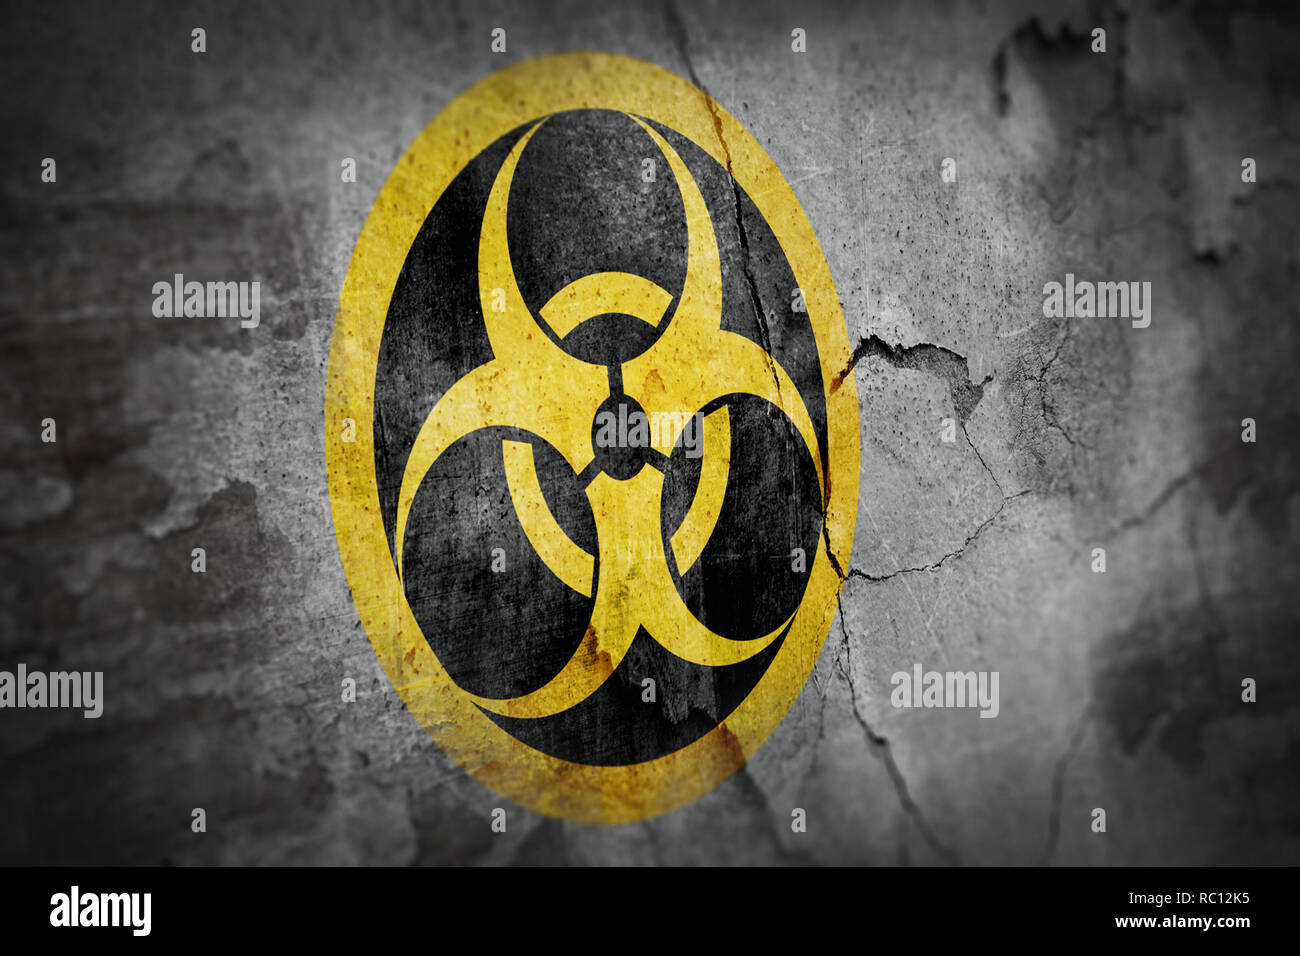 grunge biohazard symbol - Stock Image